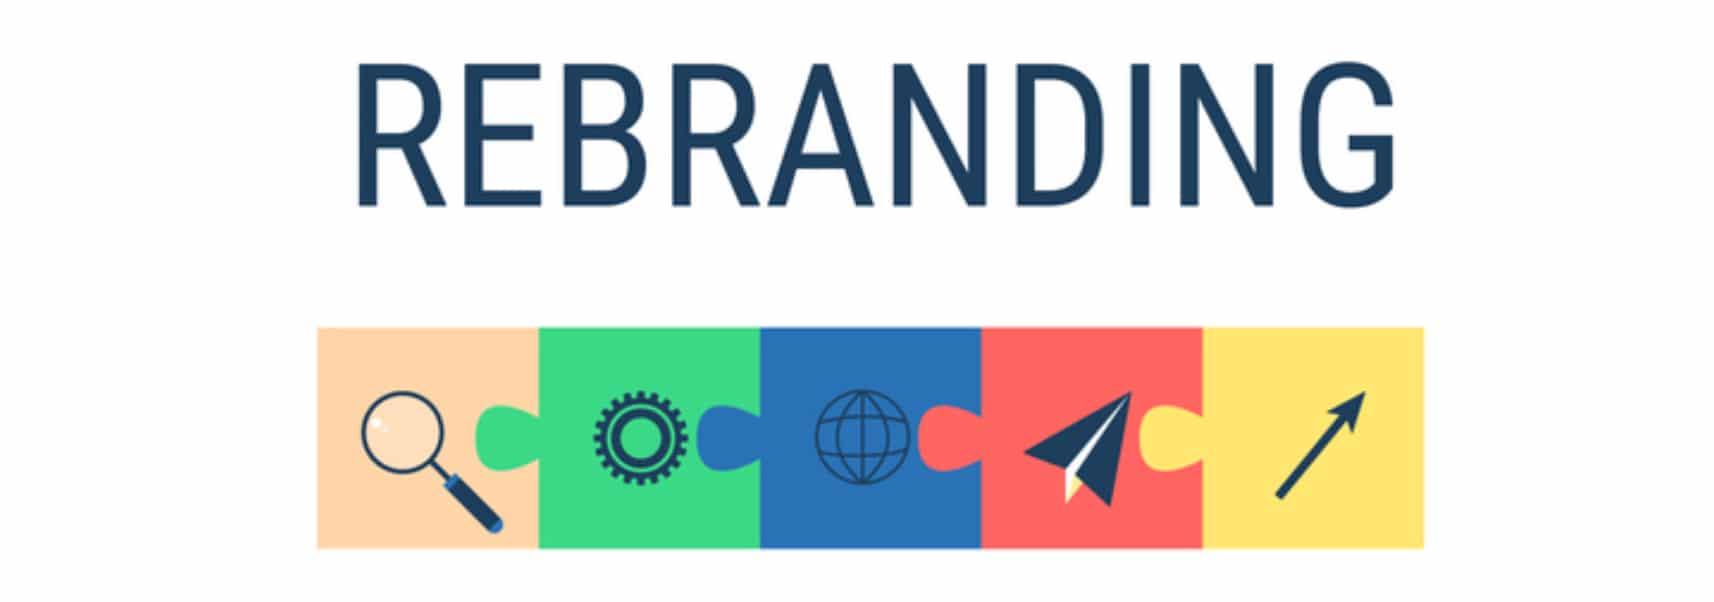 Microsoft Office 365 Rebranding April 2020